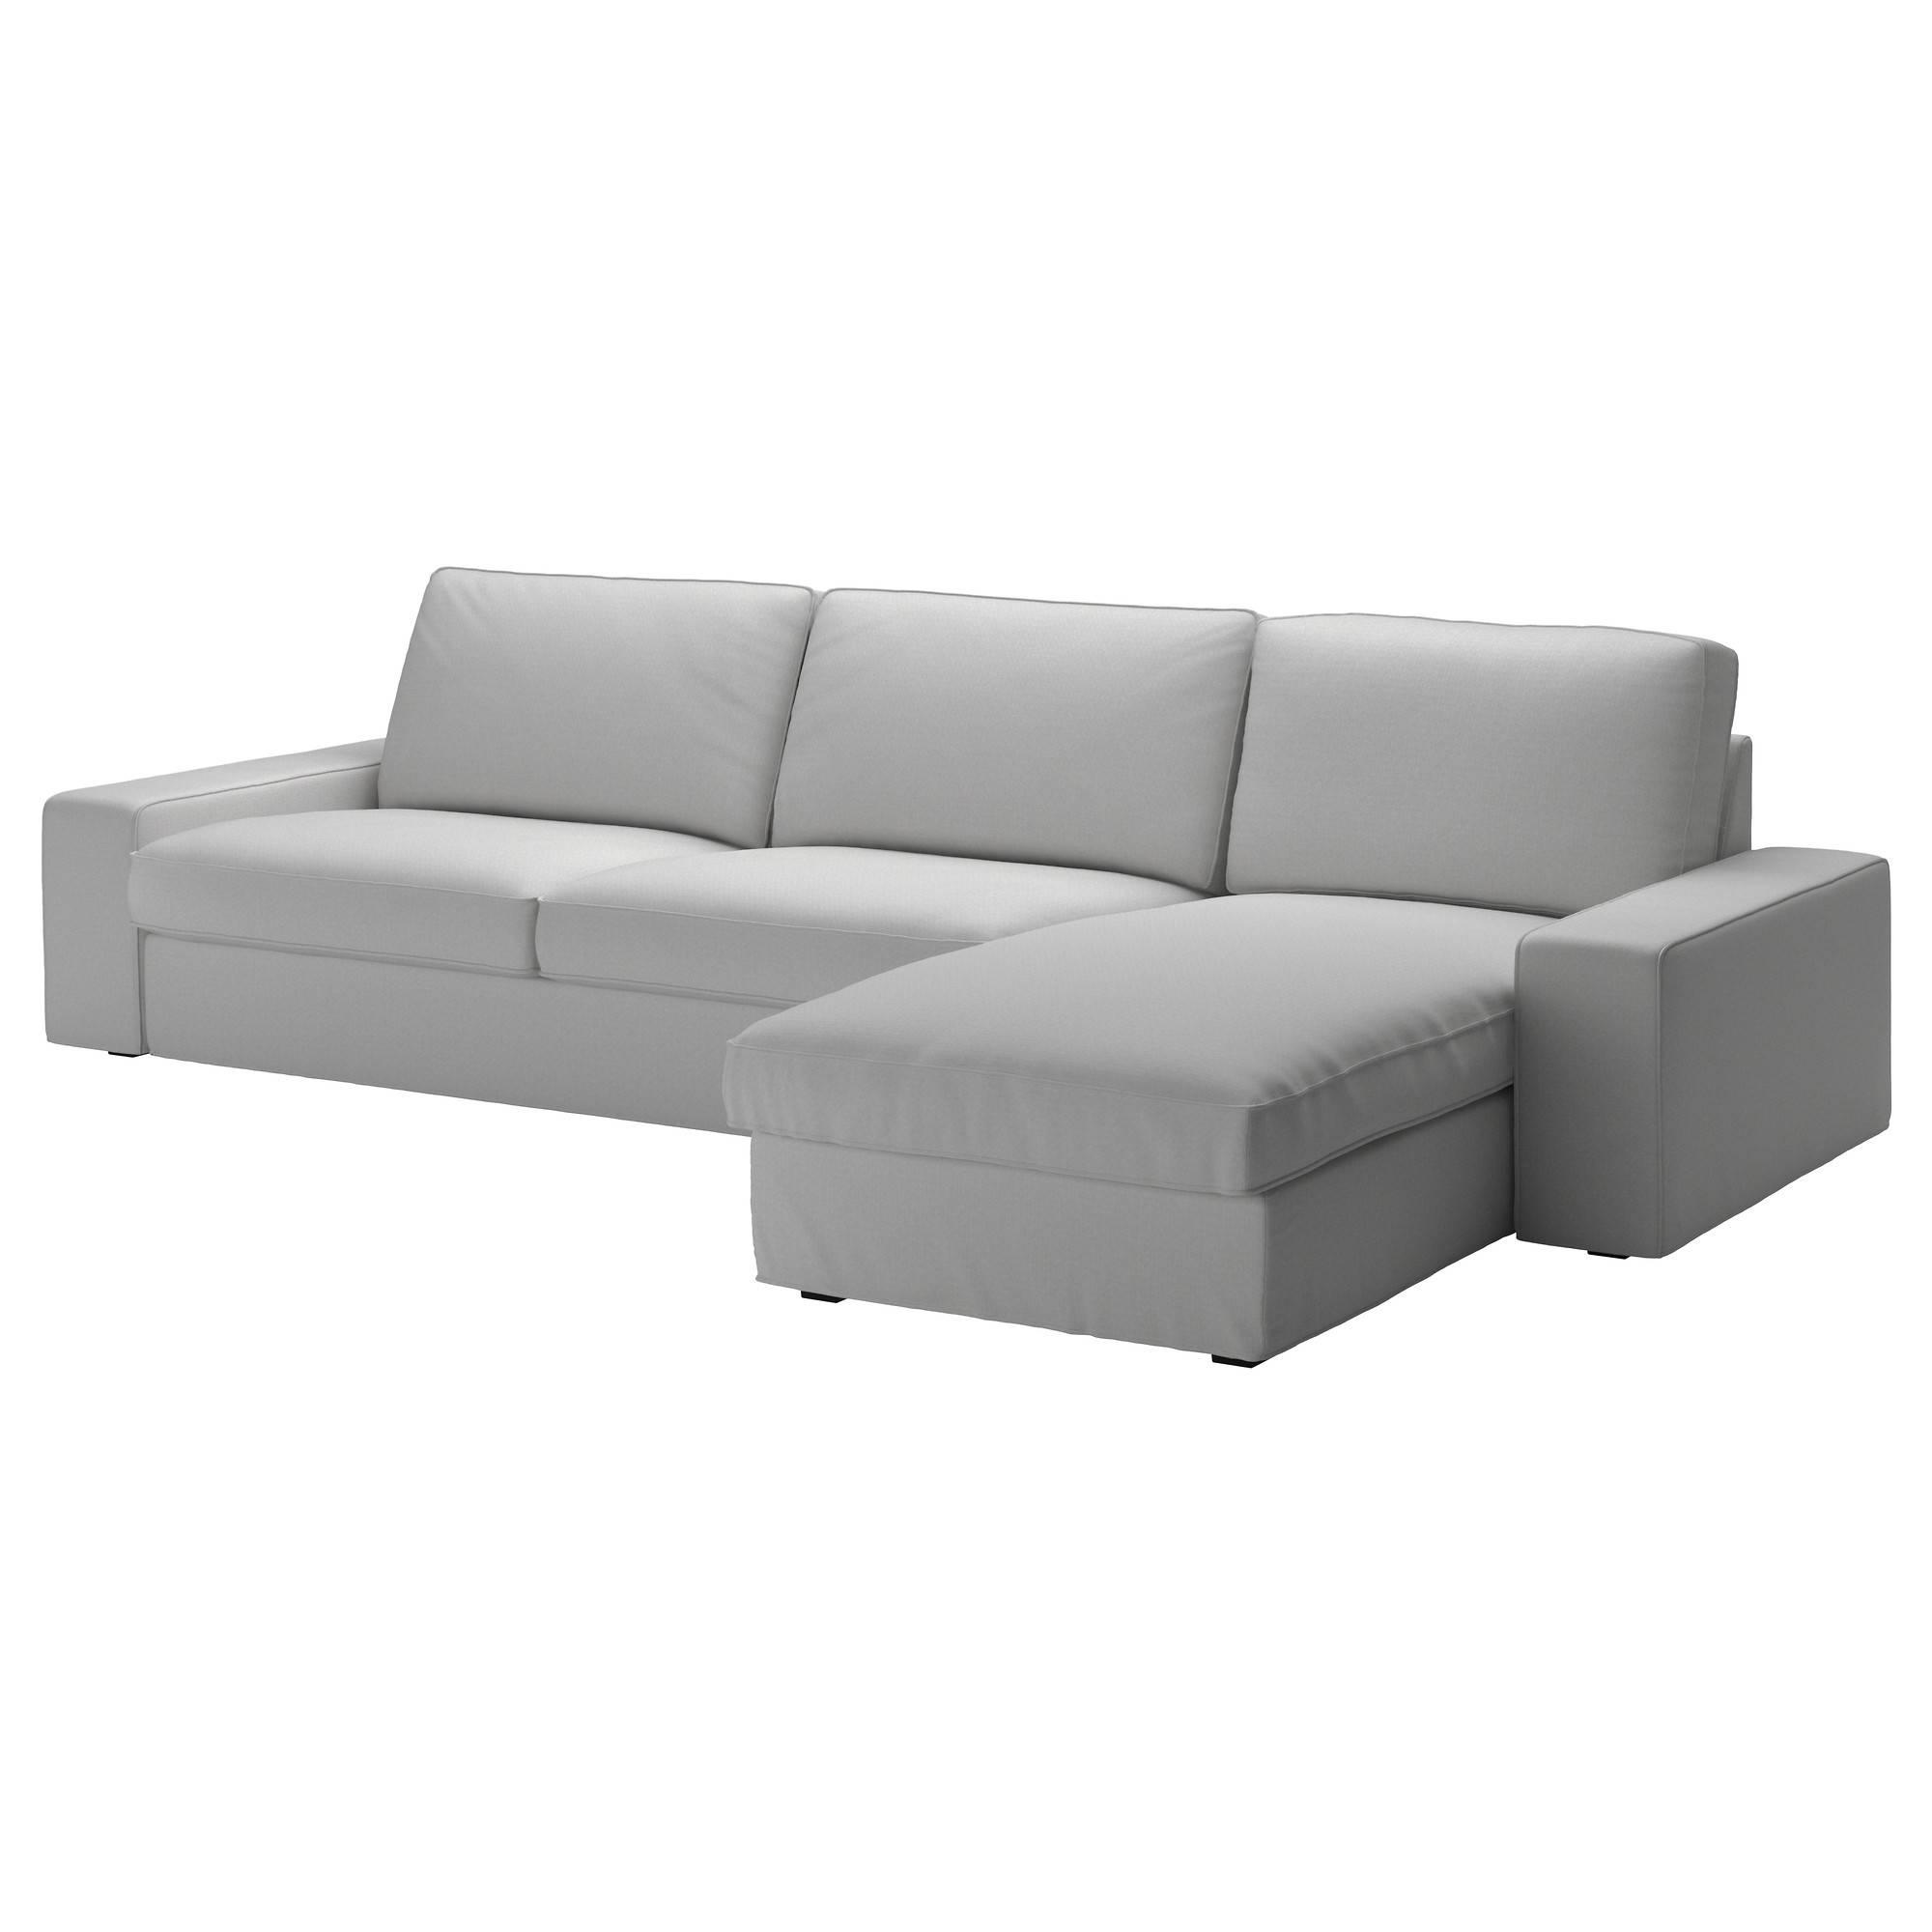 Kivik Three-Seat Sofa And Chaise Longue - Orrsta Light Grey - Ikea regarding Small Sofas Ikea (Image 14 of 30)